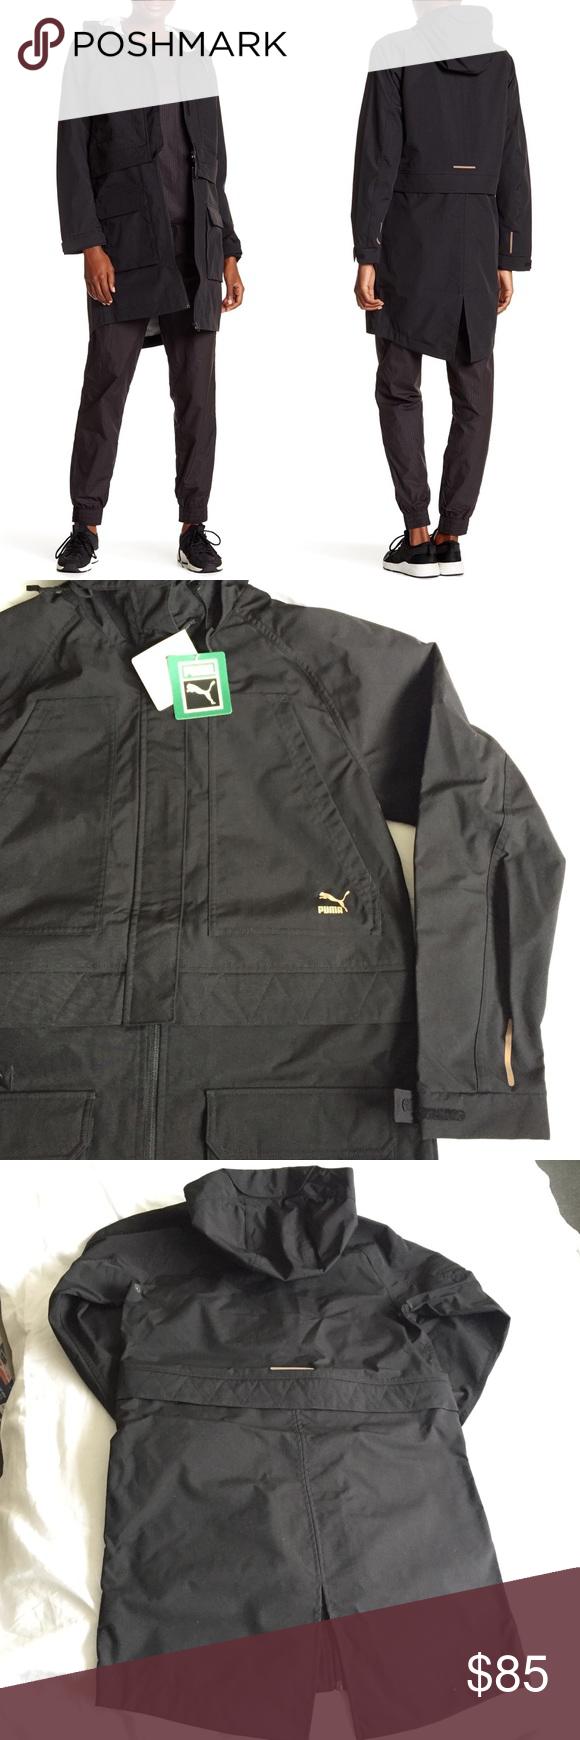 Hp Nwt Puma Utility Detachable Parka Jacket Functional Jackets Puma Jackets Parka Jacket [ 1740 x 580 Pixel ]